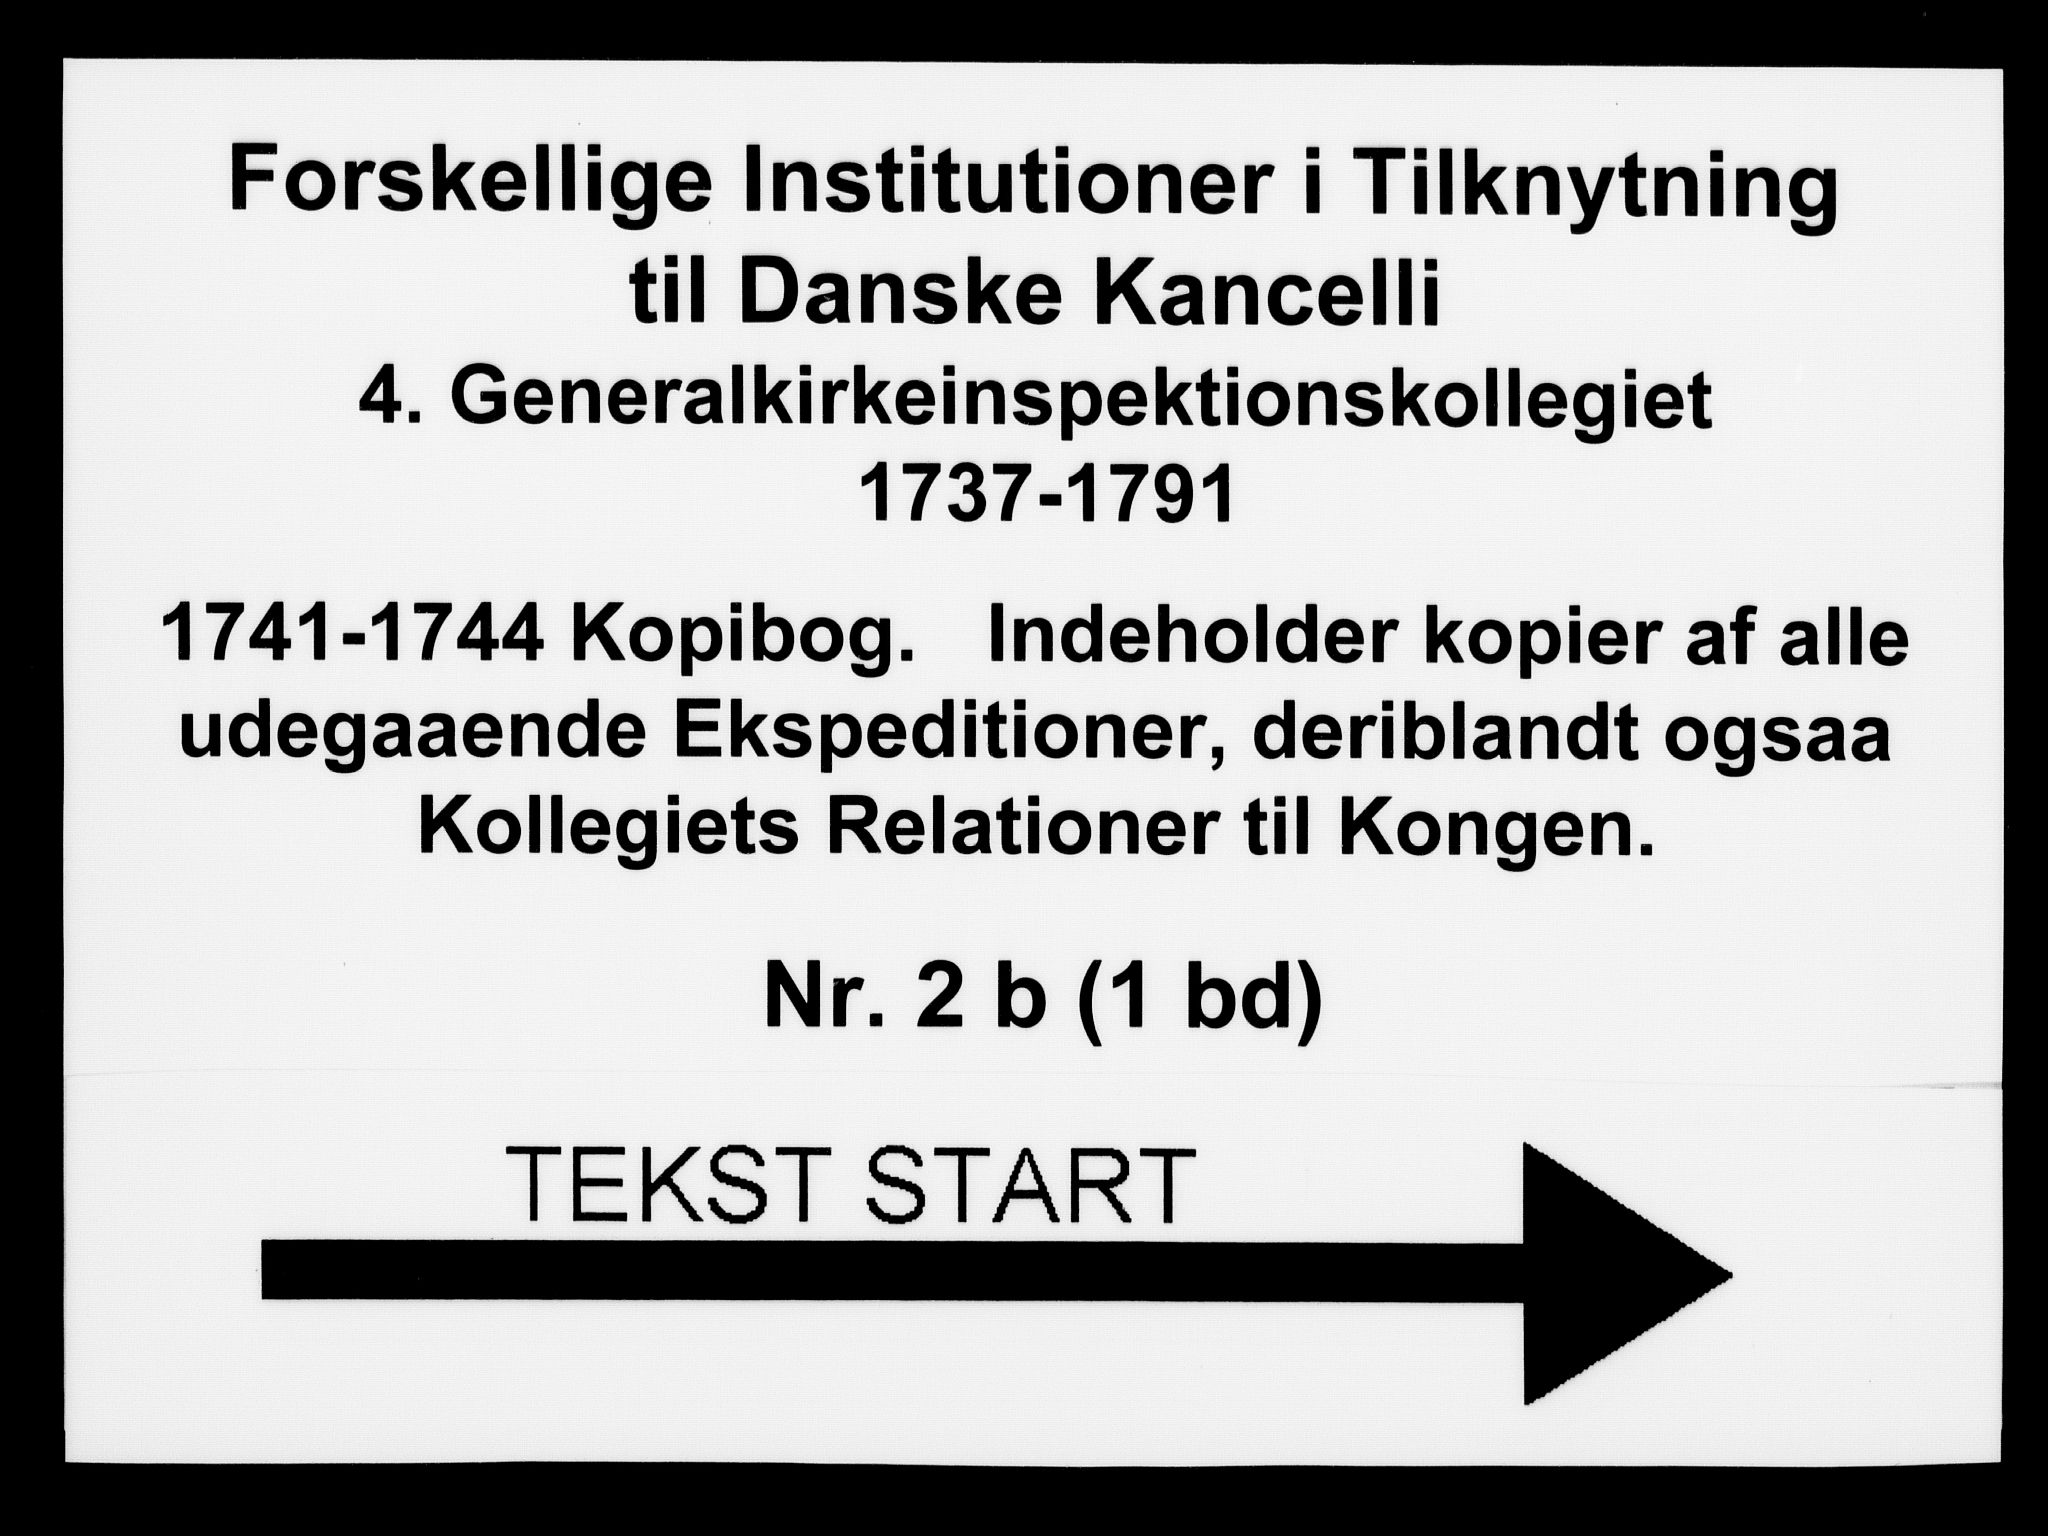 DRA, Generalkirkeinspektionskollegiet, F4-02/F4-02-02: Kopibog, 1741-1744